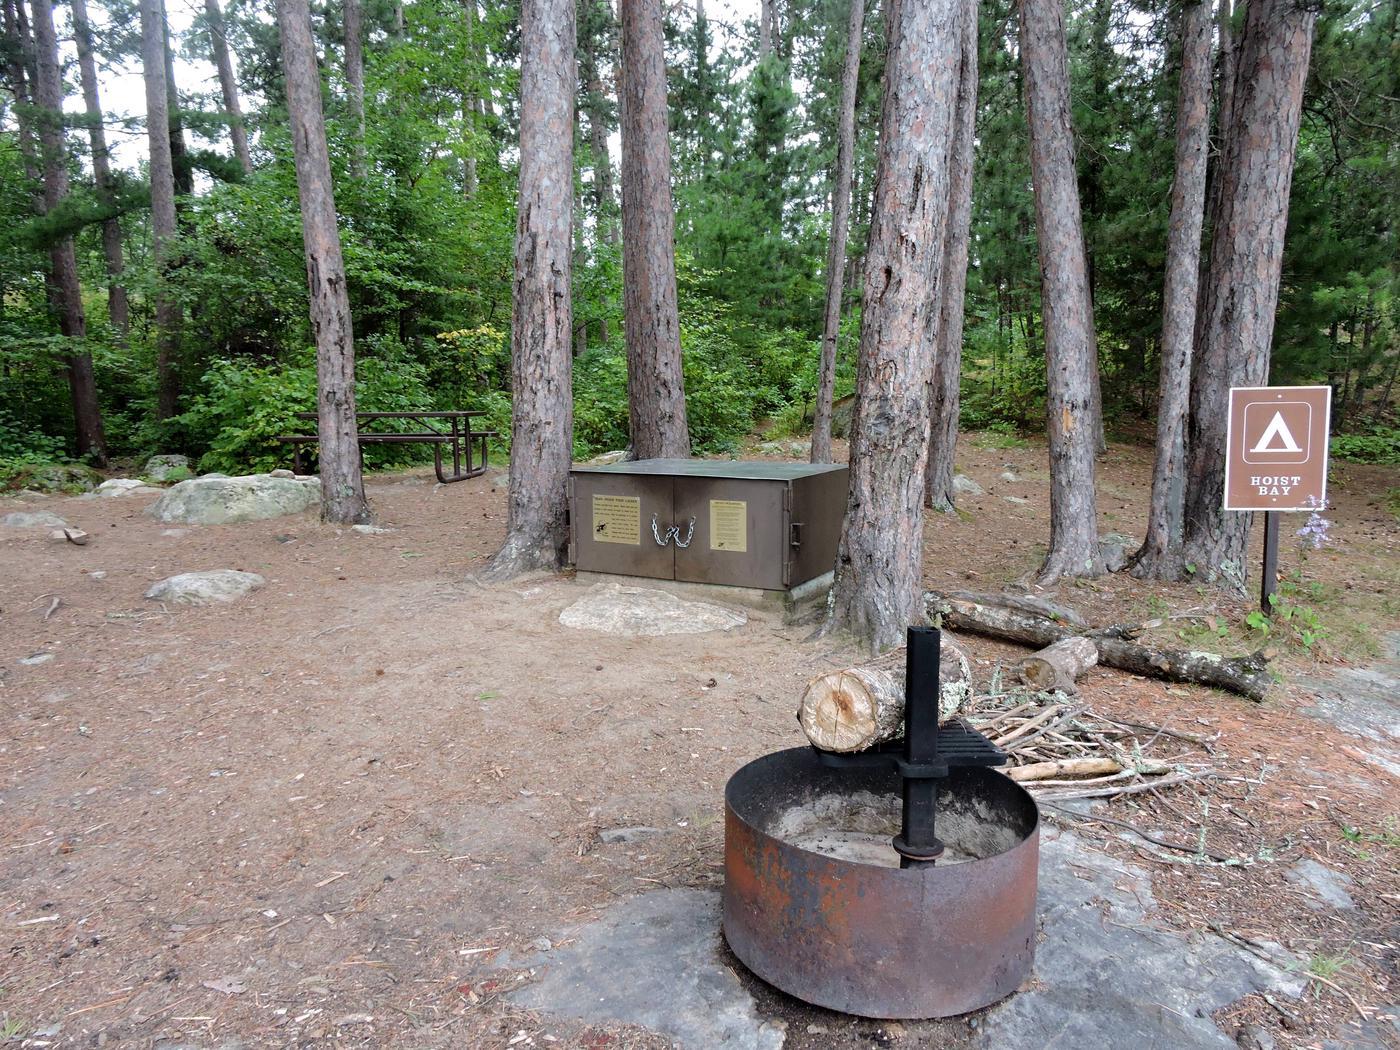 N12 - Hoist BayView of campsite